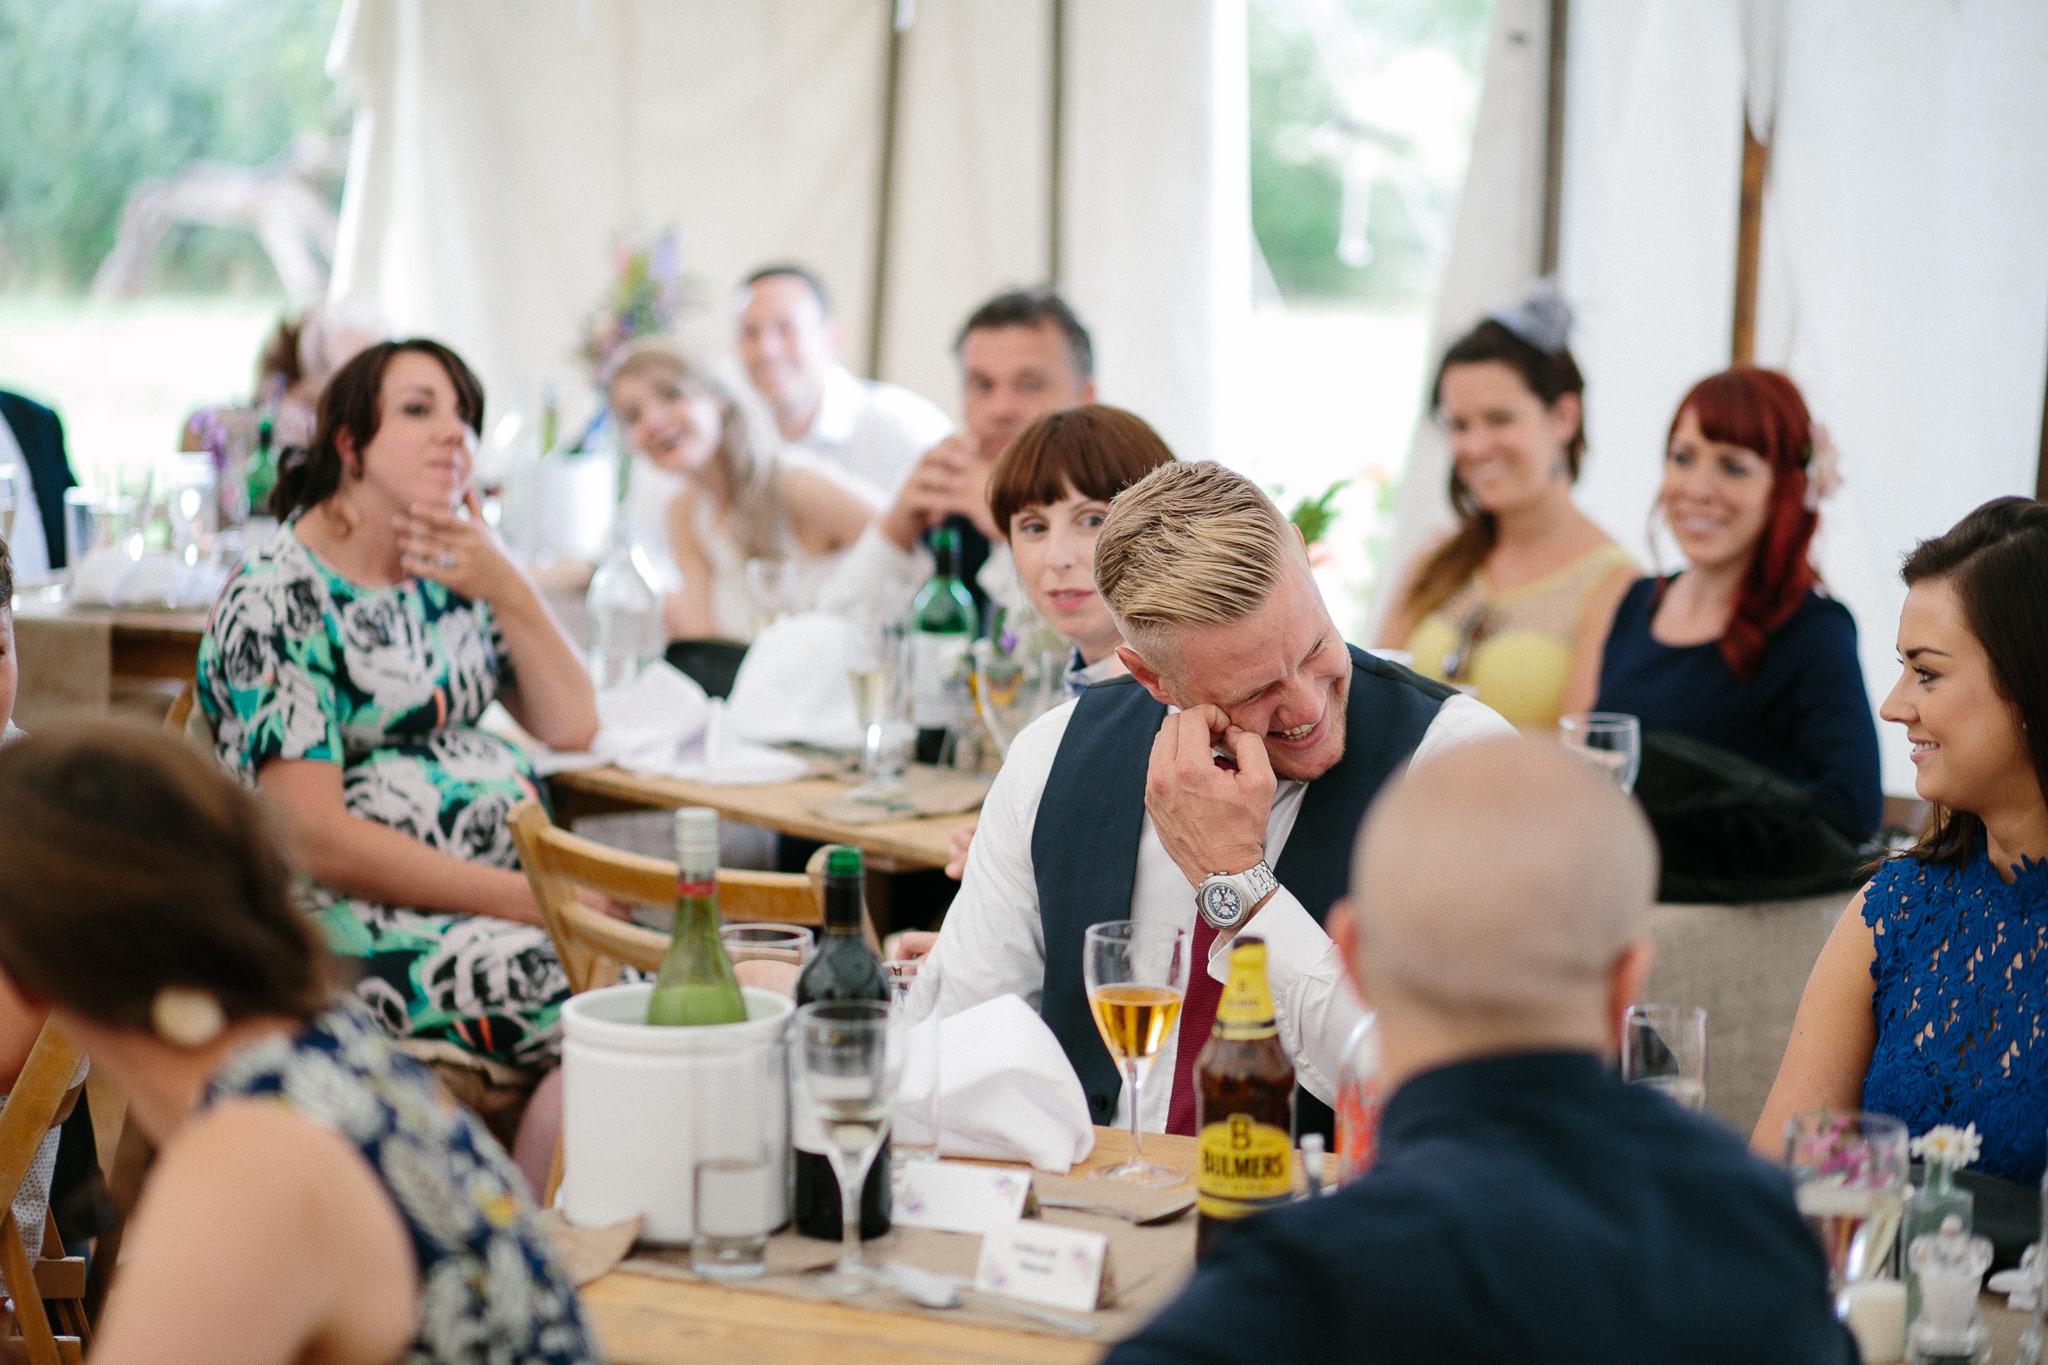 grantham_wedding_photographer-103.jpg